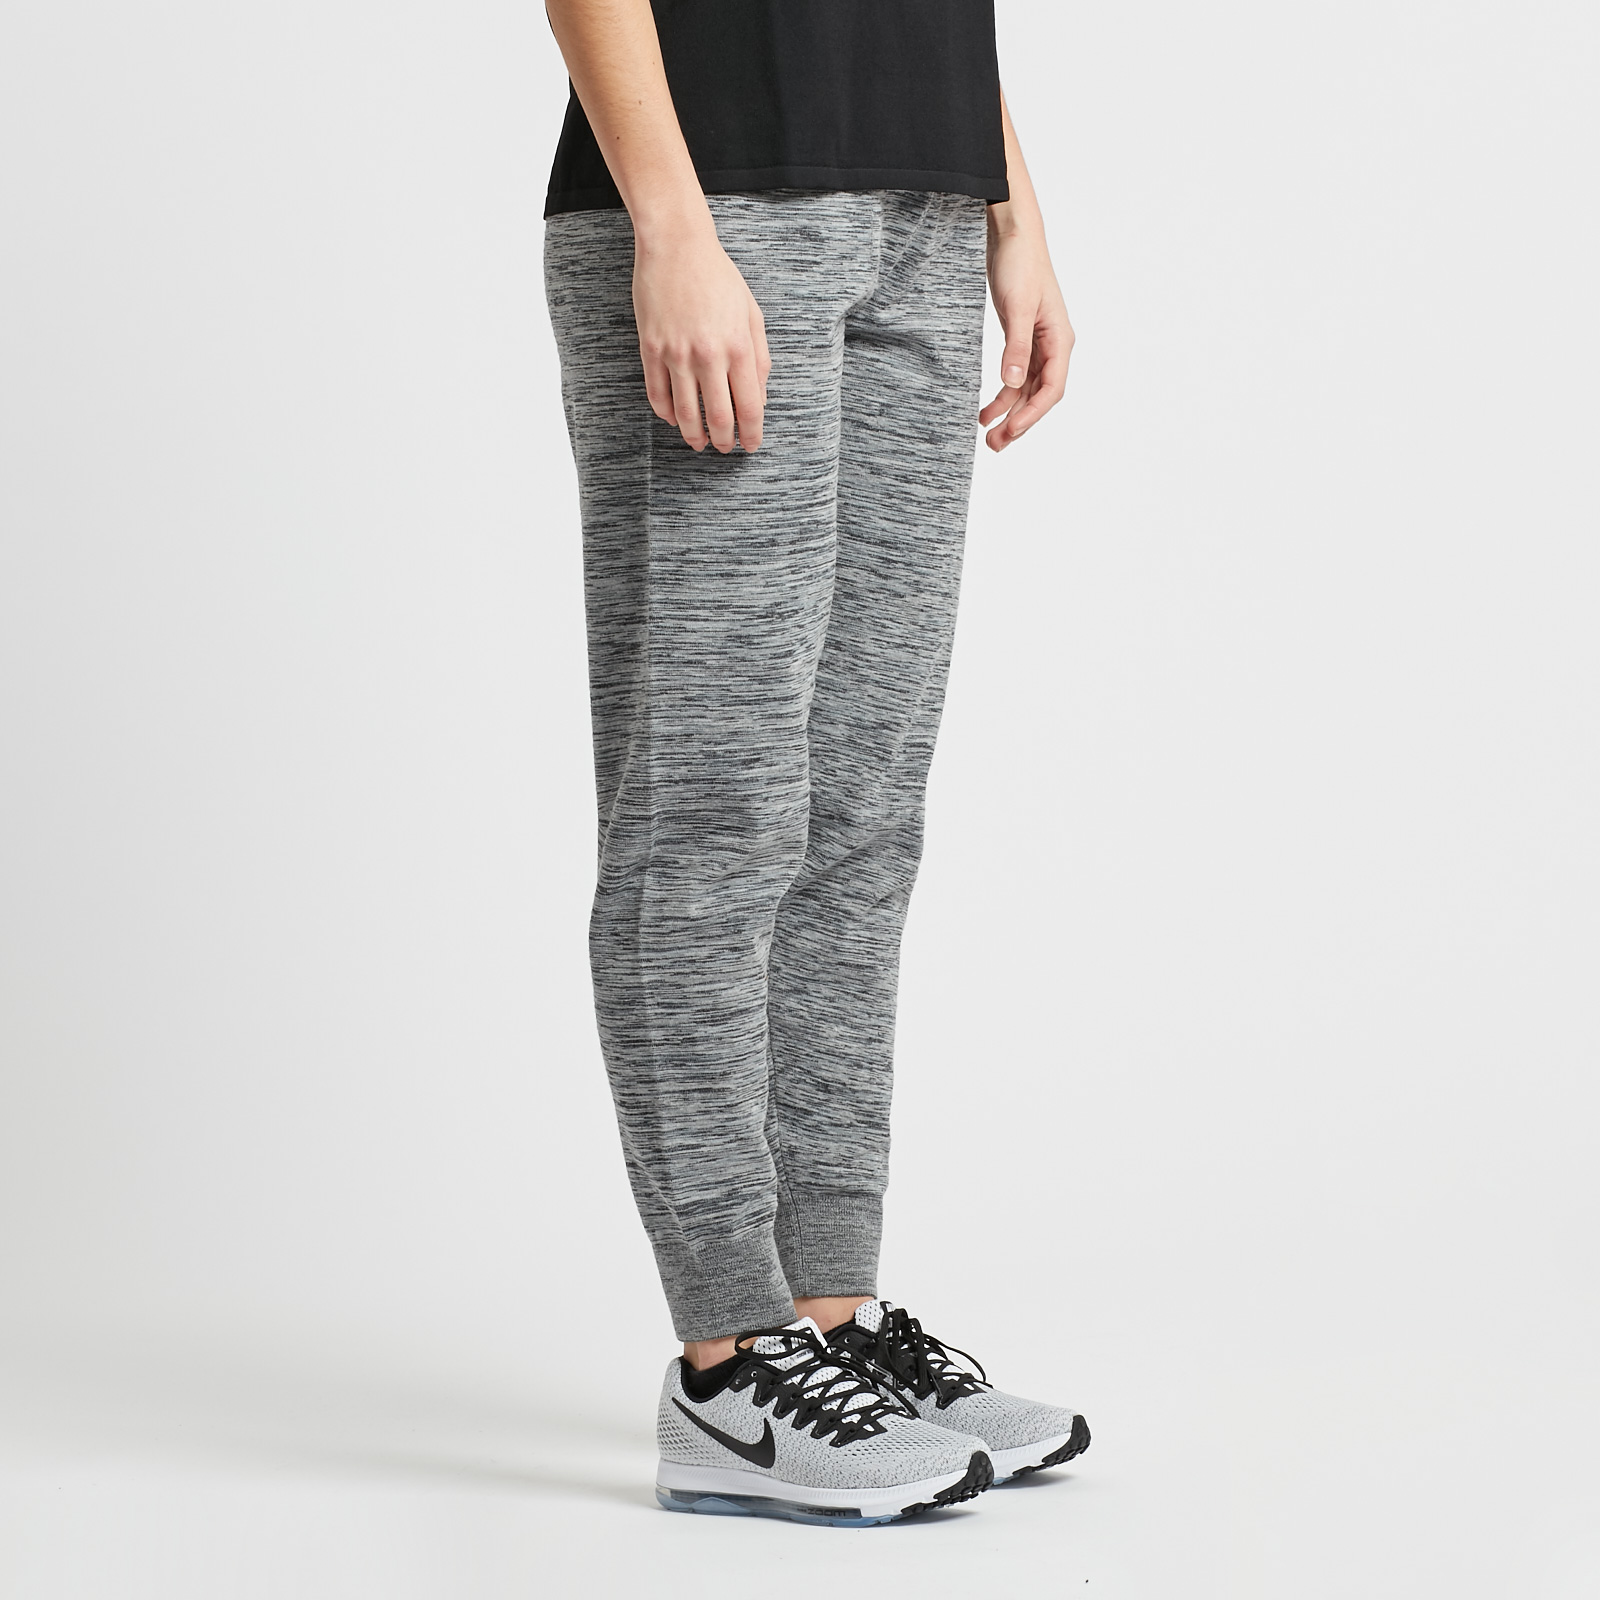 Nike Wmns Nsw Tech Knit Pant 831677 091 Sneakersnstuff